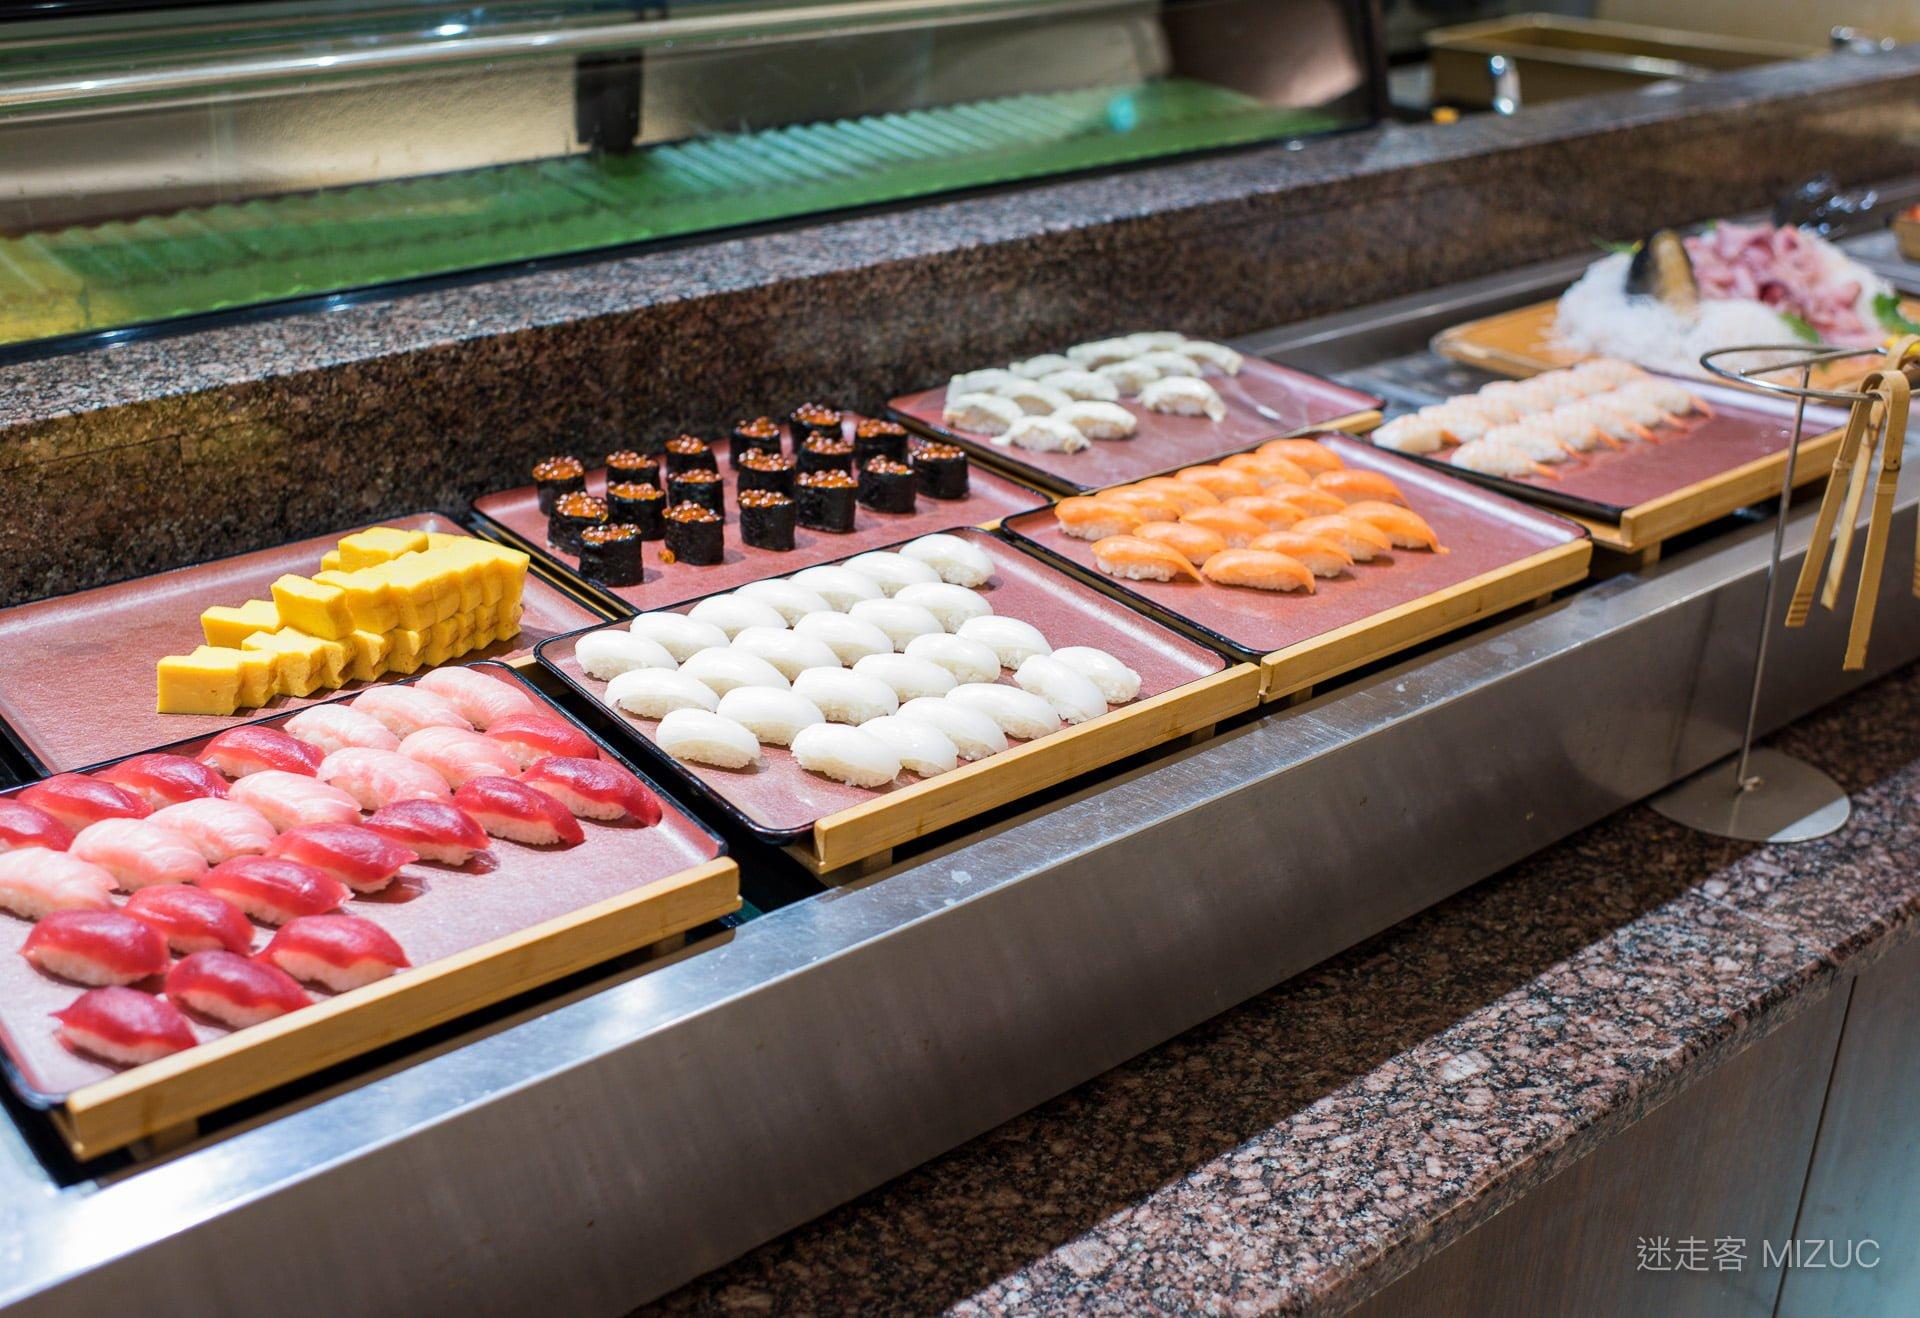 201711 Ibaraki Tochigi Gunma Japan Travel By RentalCar 46 日本自駕旅遊/北關東三縣「茨城、櫪木、群馬」秋天美食、溫泉與瀑布秘境百景(精選照片分享)